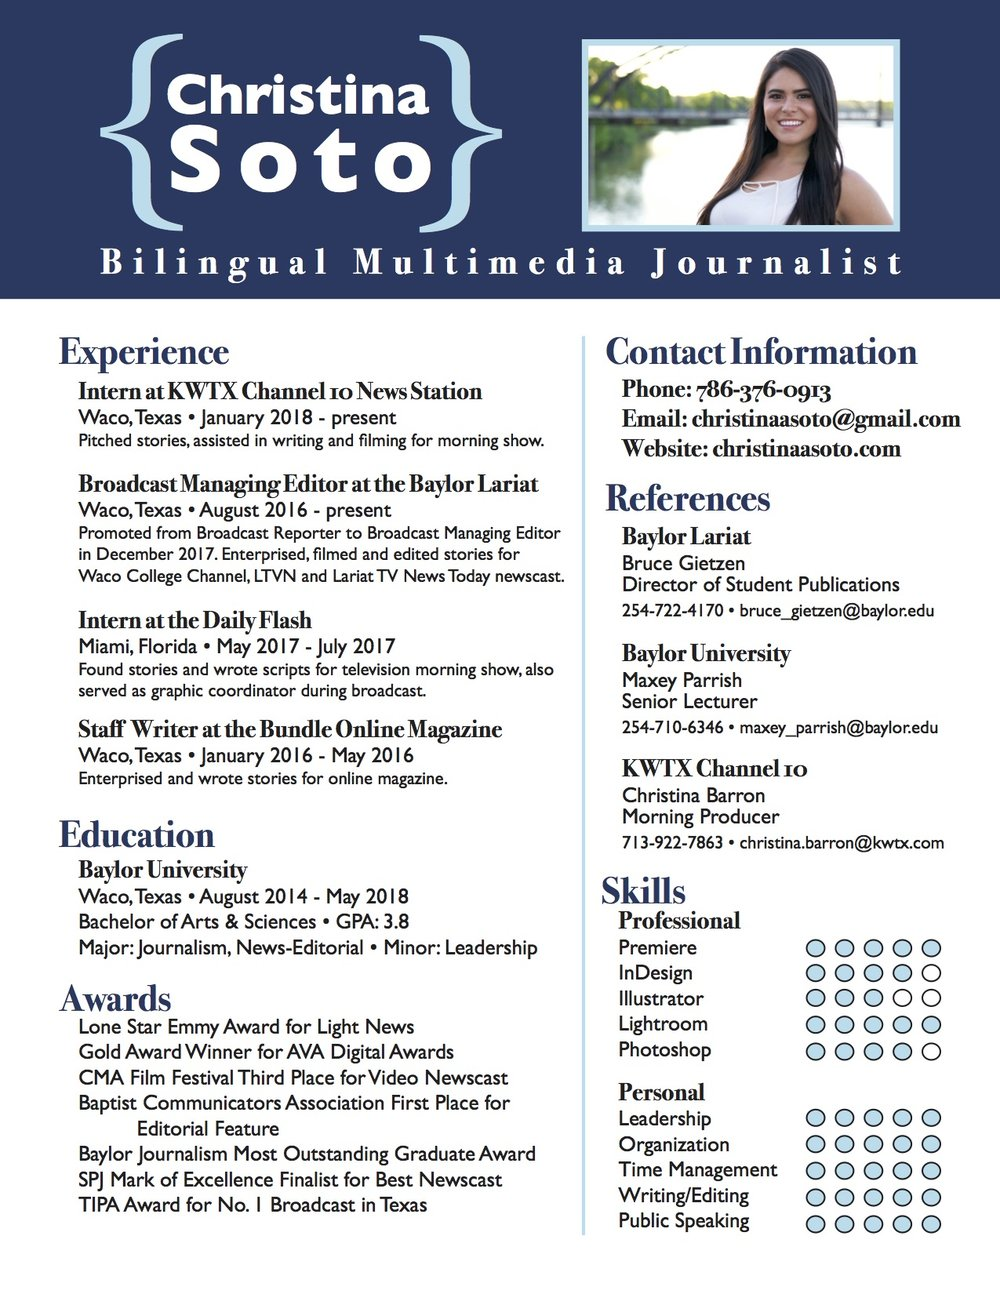 Resume — Christina Soto